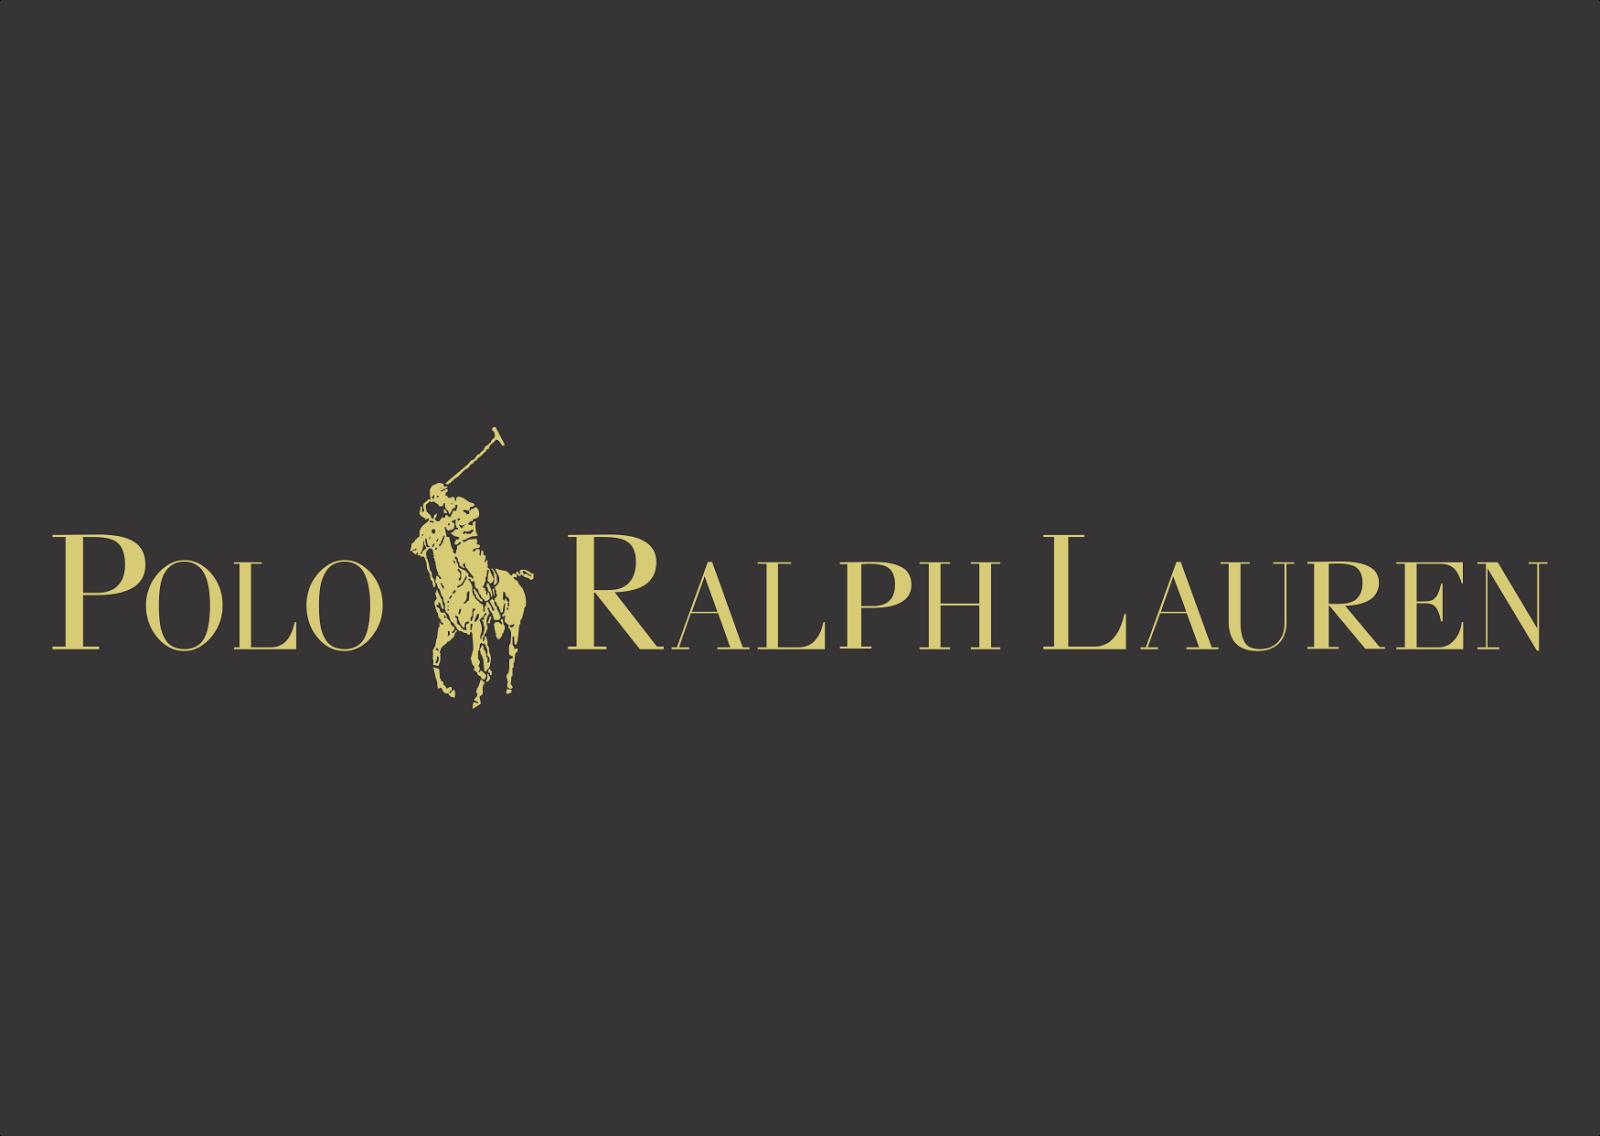 TShirts Ralph Lauren  Achetez jusquà 60  Stylight